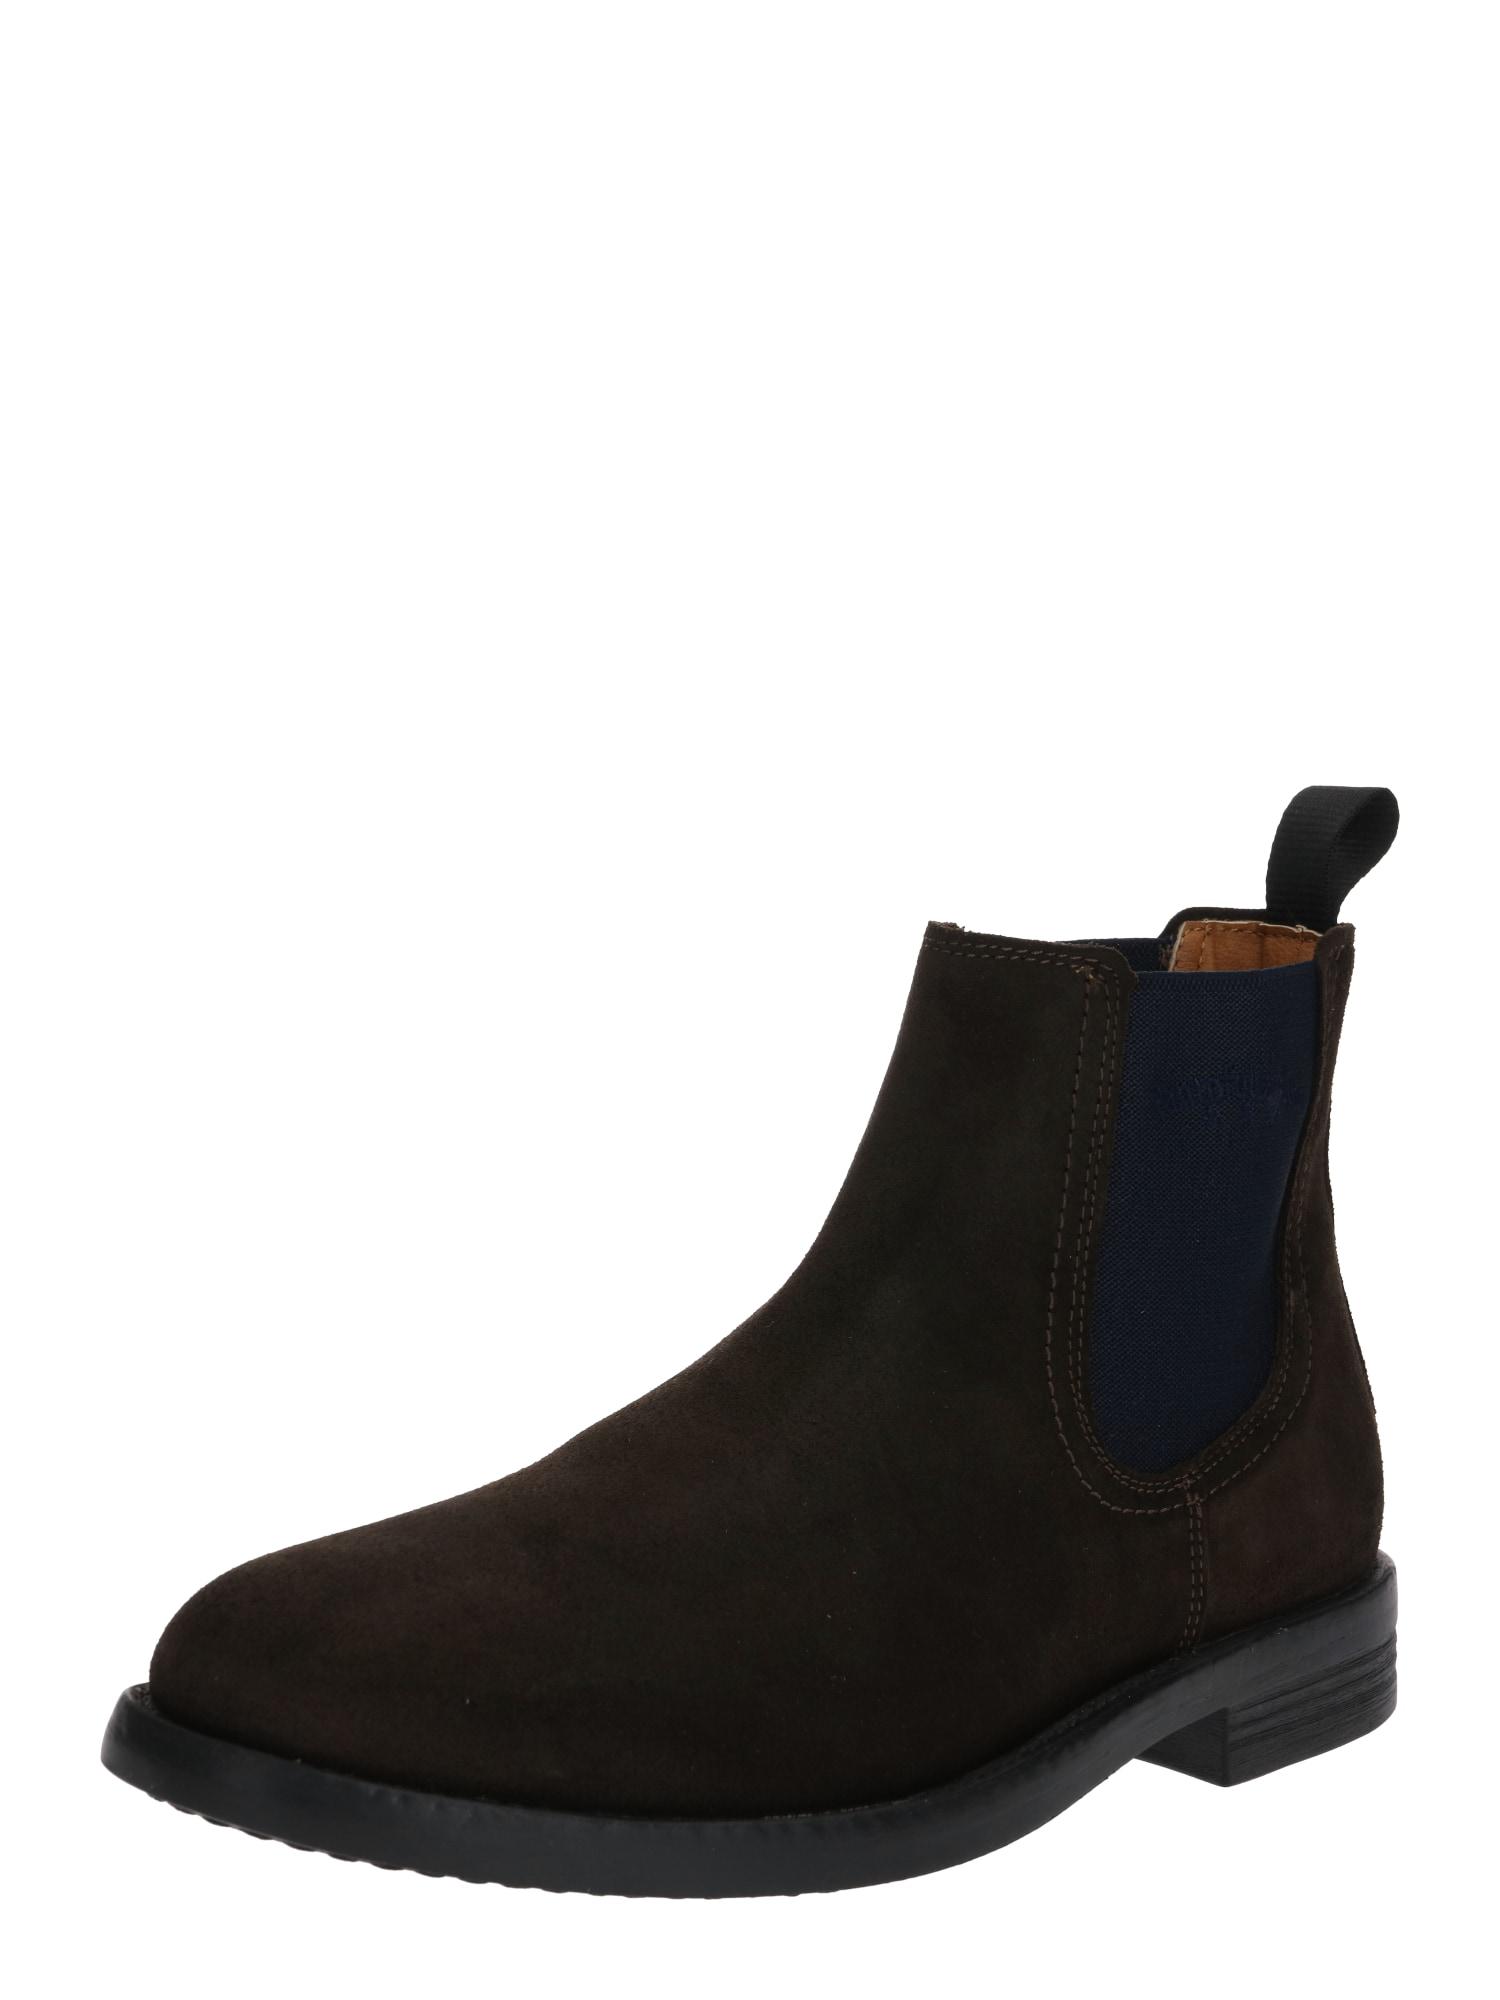 PANTOFOLA D'ORO Chelsea batai tamsiai ruda